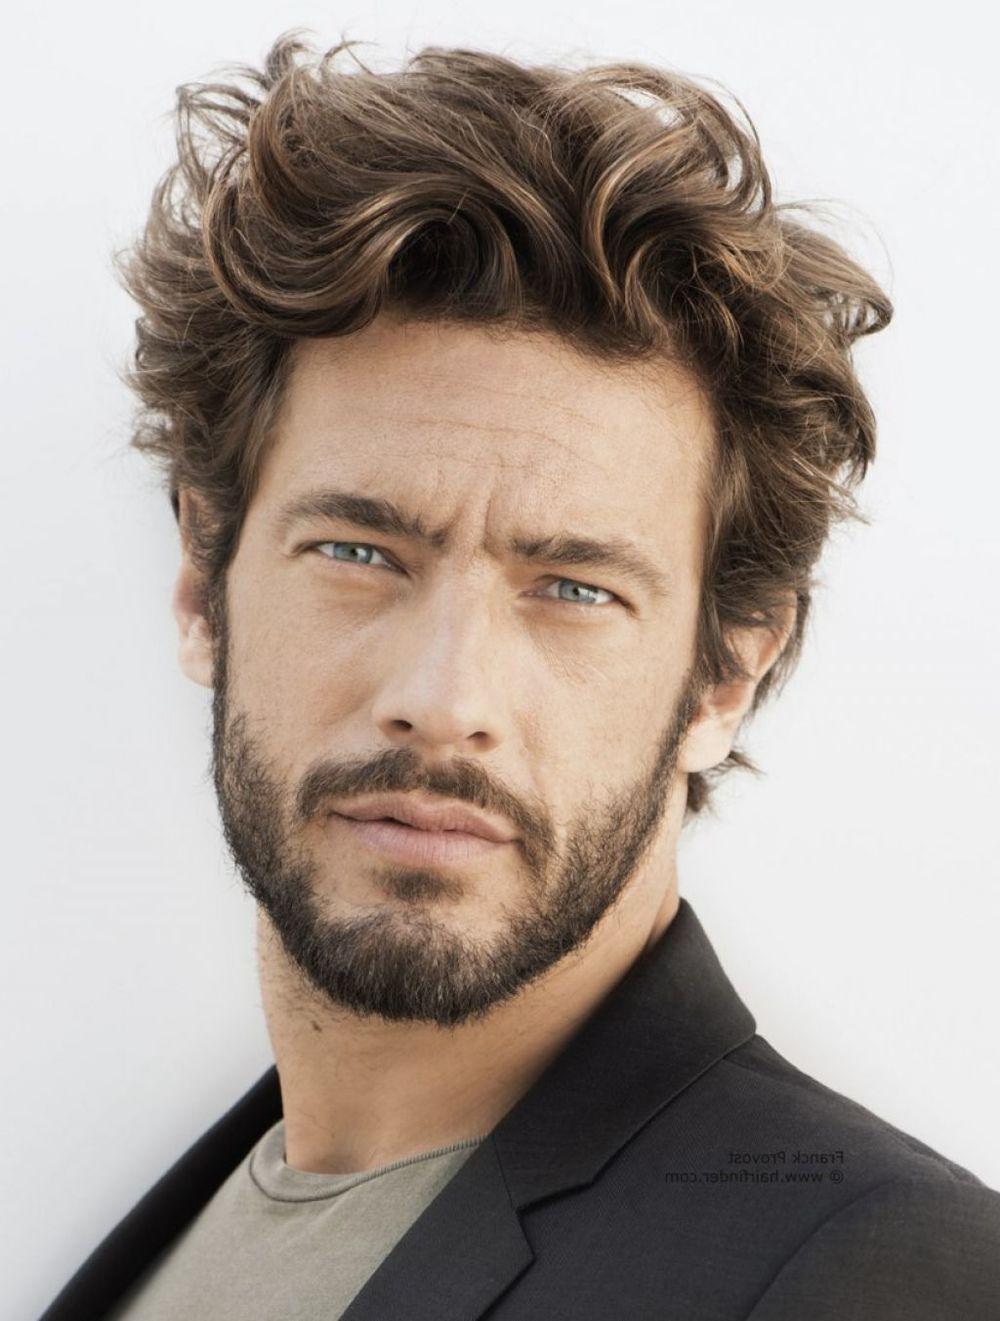 black-men-beard-styles-54eff2586944b.jpg